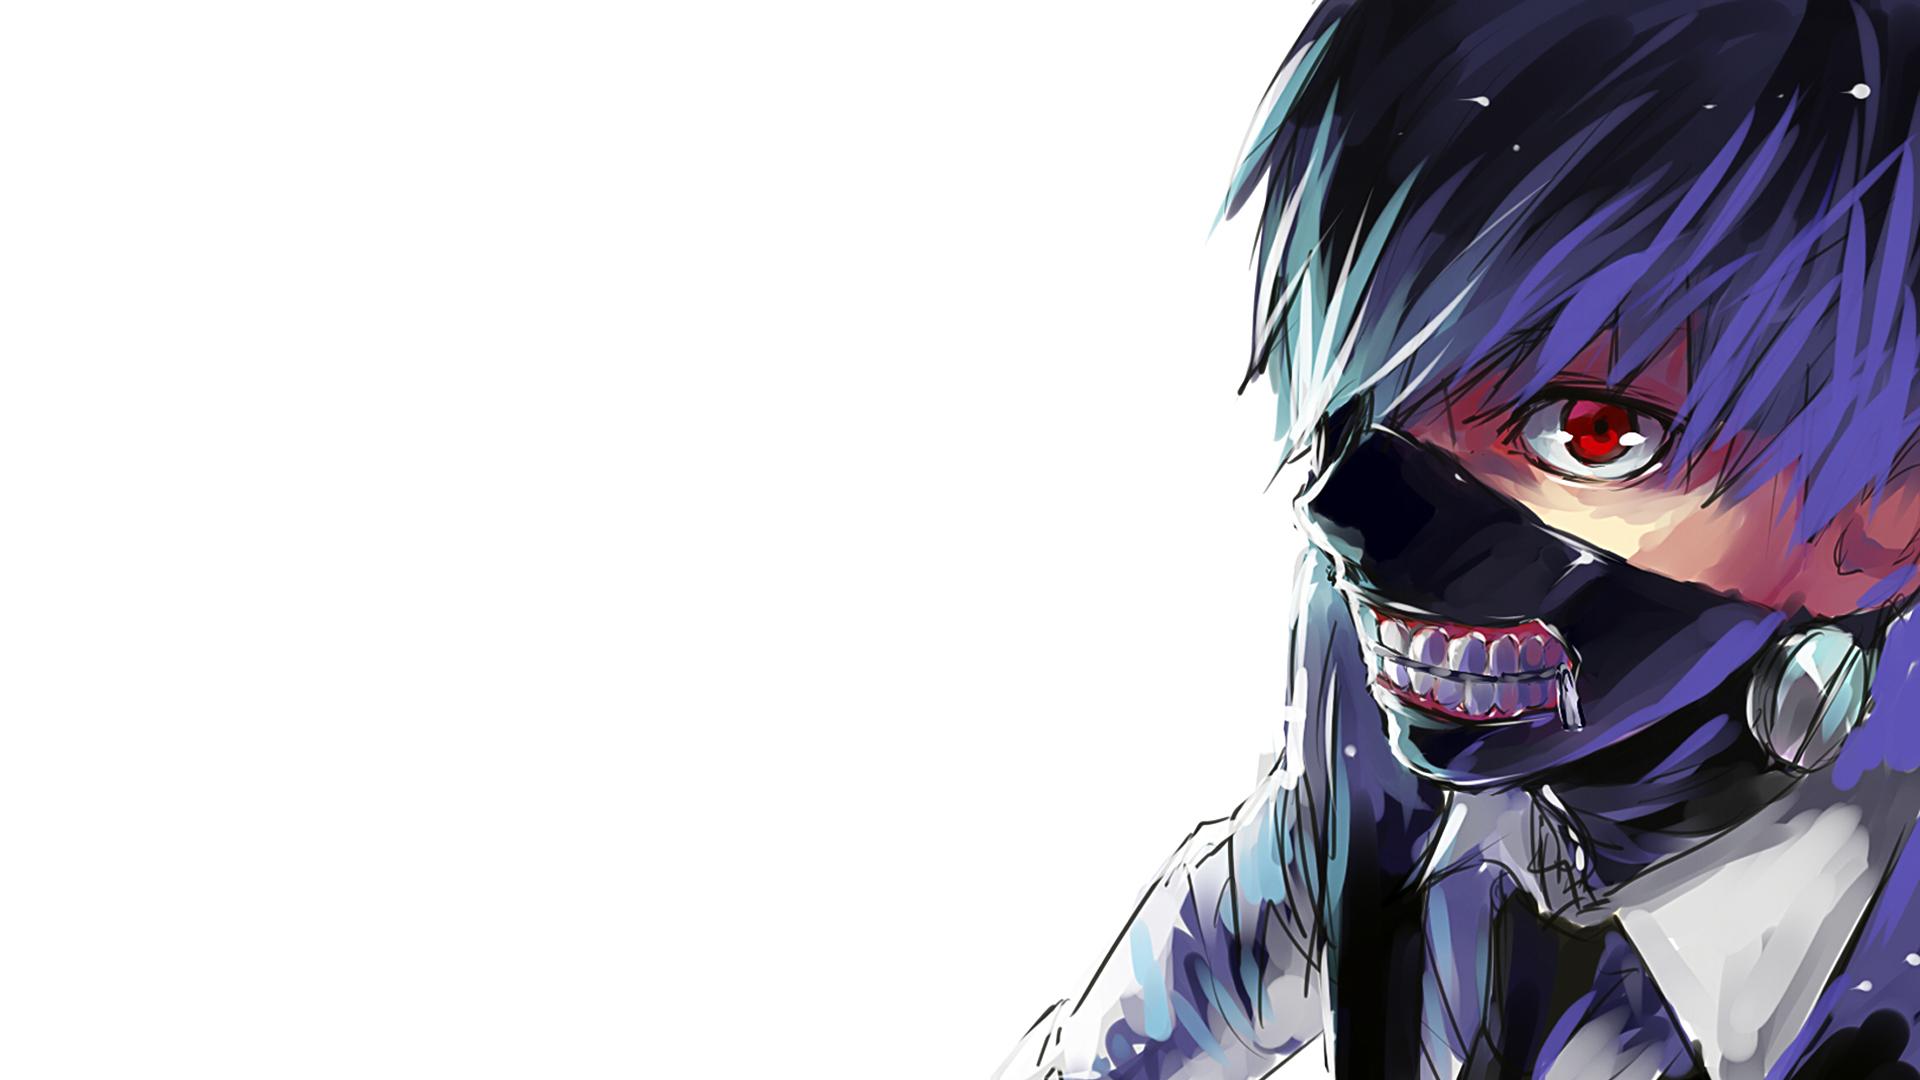 Hd wallpaper tokyo ghoul - Mask Tokyo Ghoul Anime Hd Wallpaper